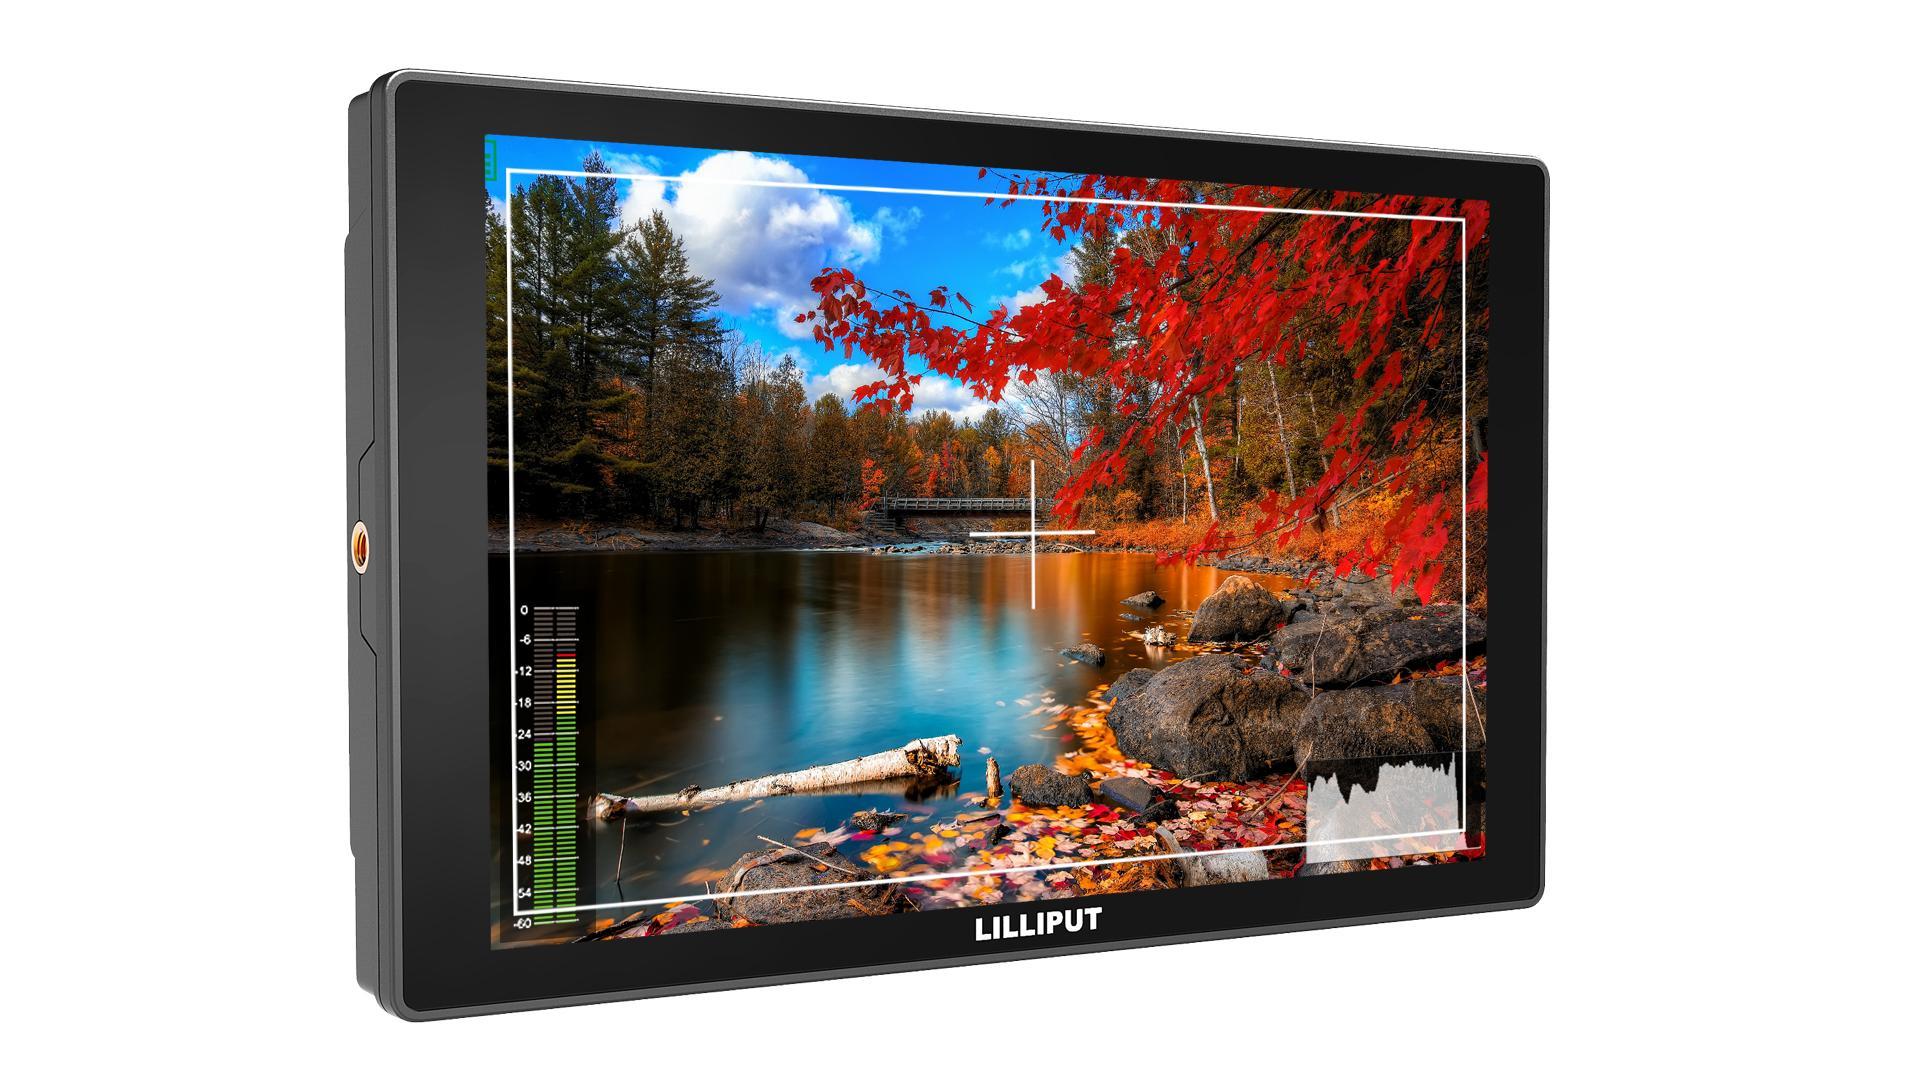 LILLIPUT 10.1'' FHD HDMI/SDI Monitor